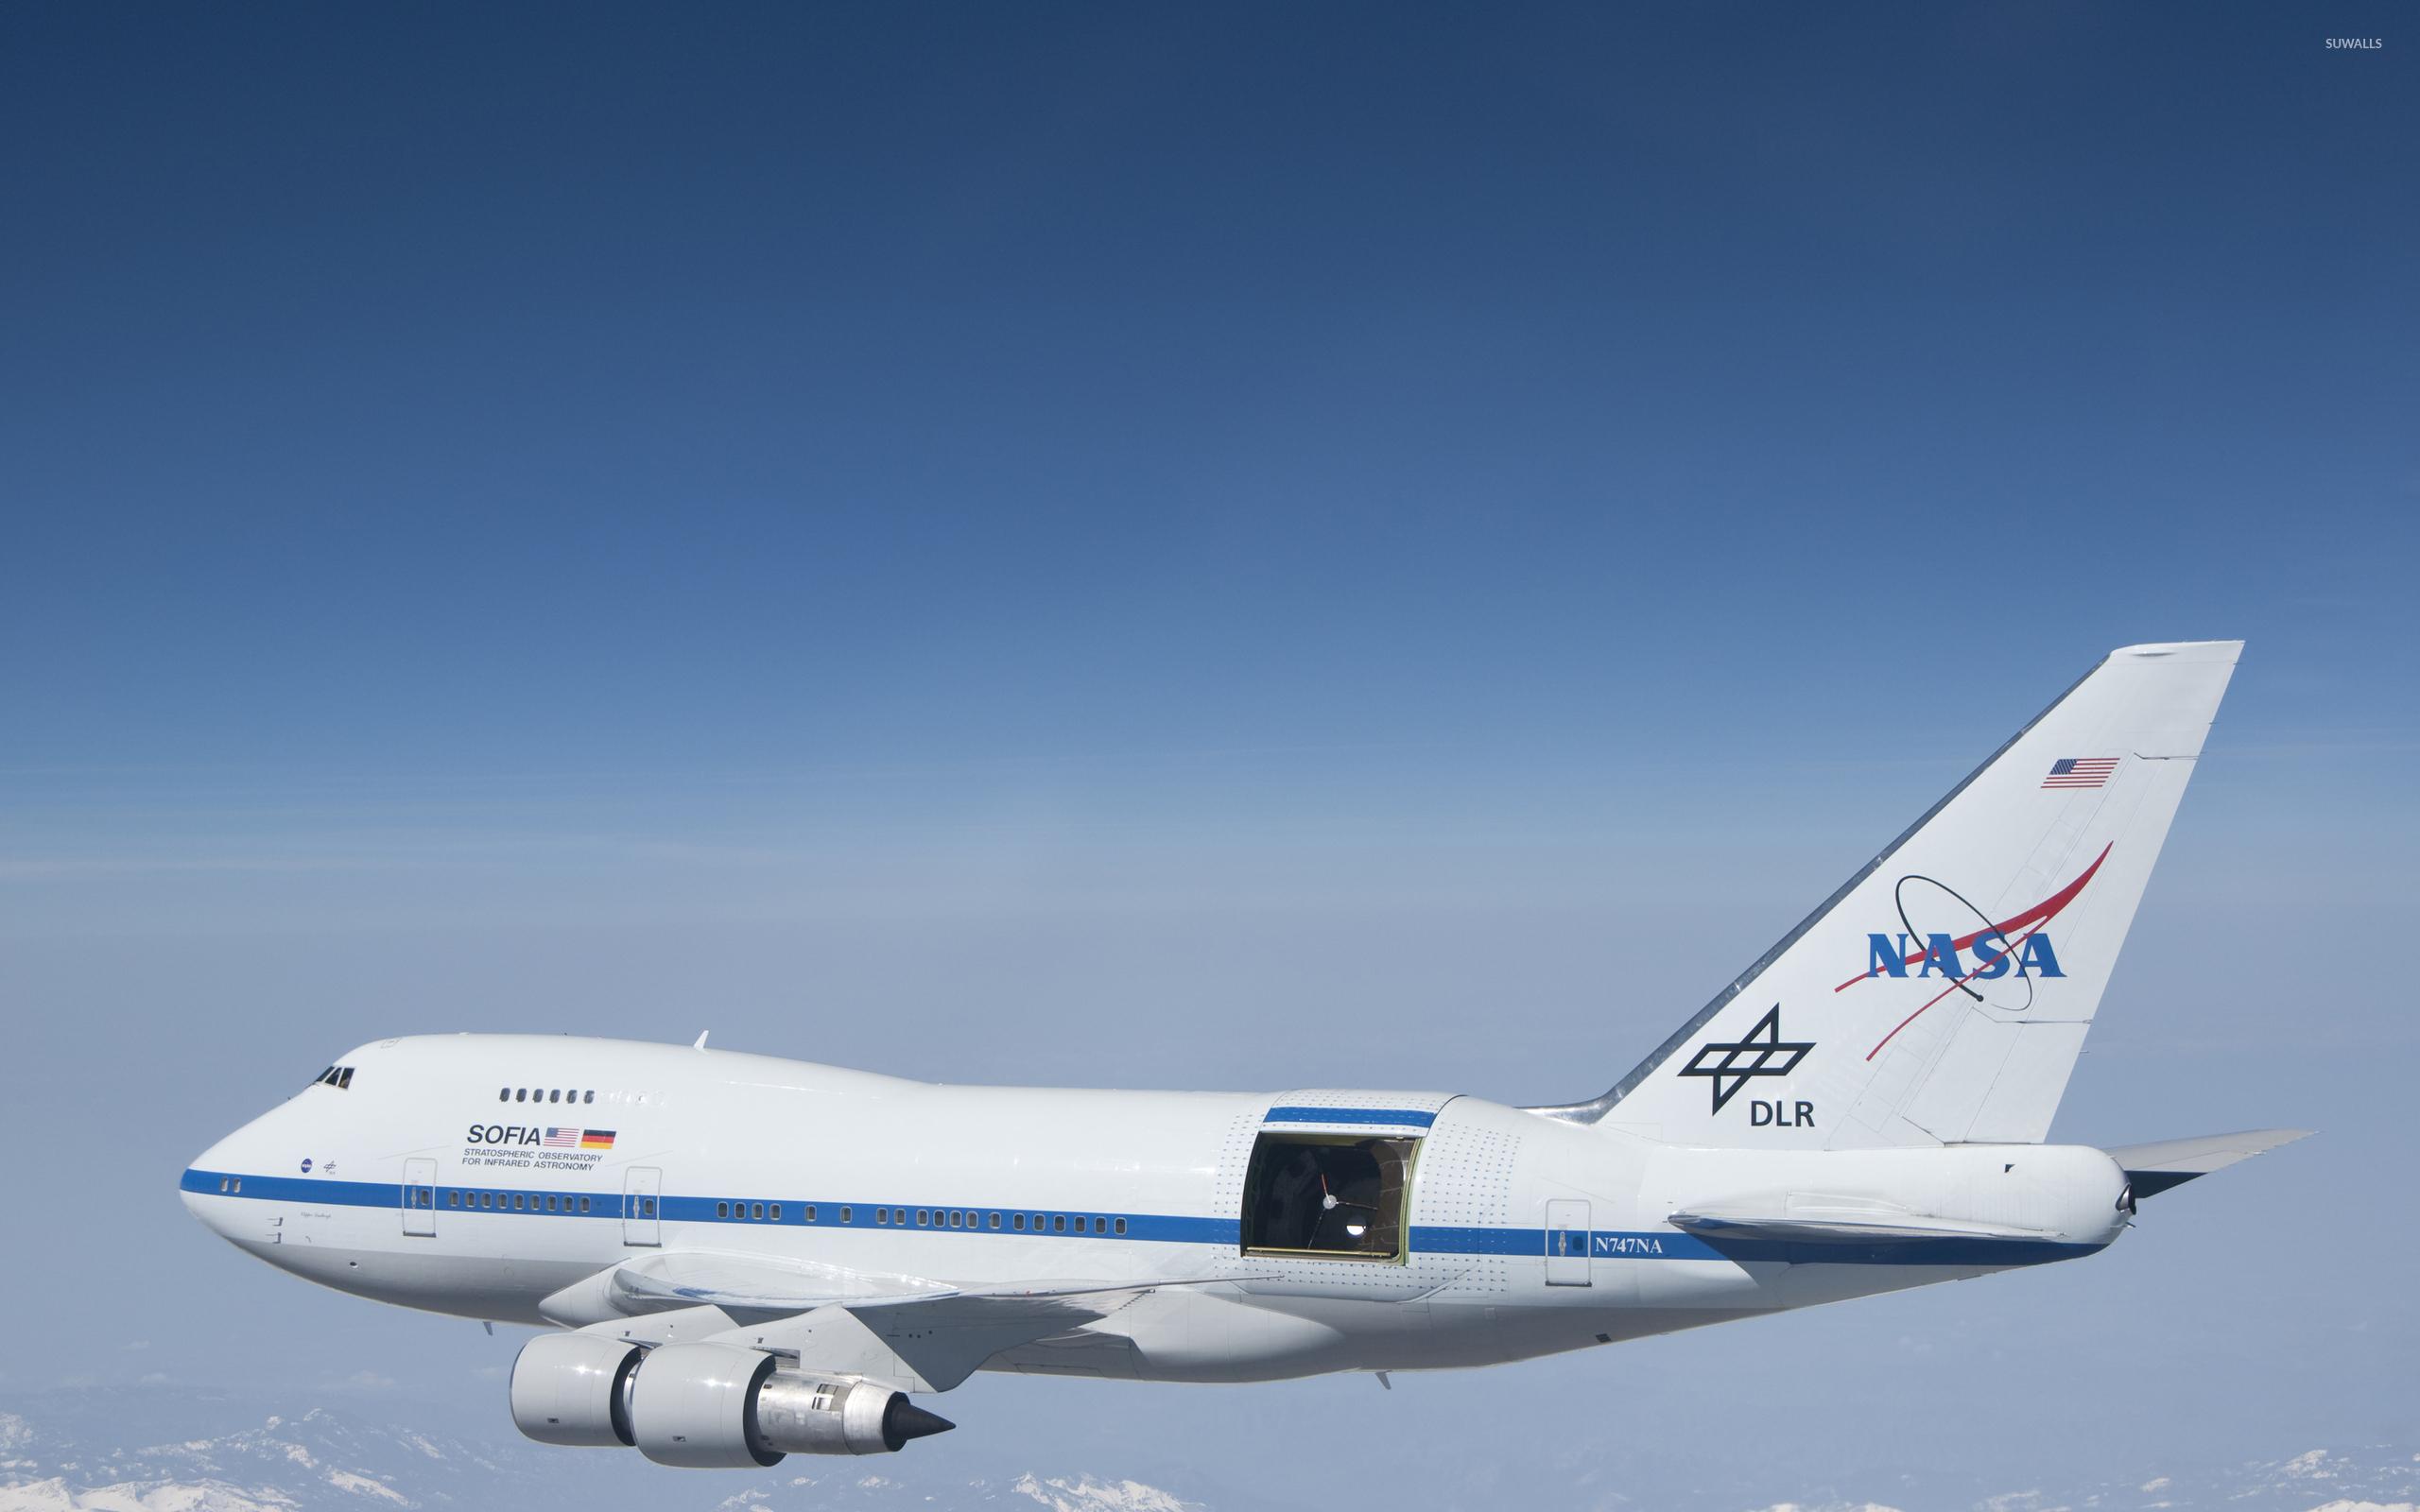 nasa boeing 747 in-flight wallpaper - aircraft wallpapers - #49149